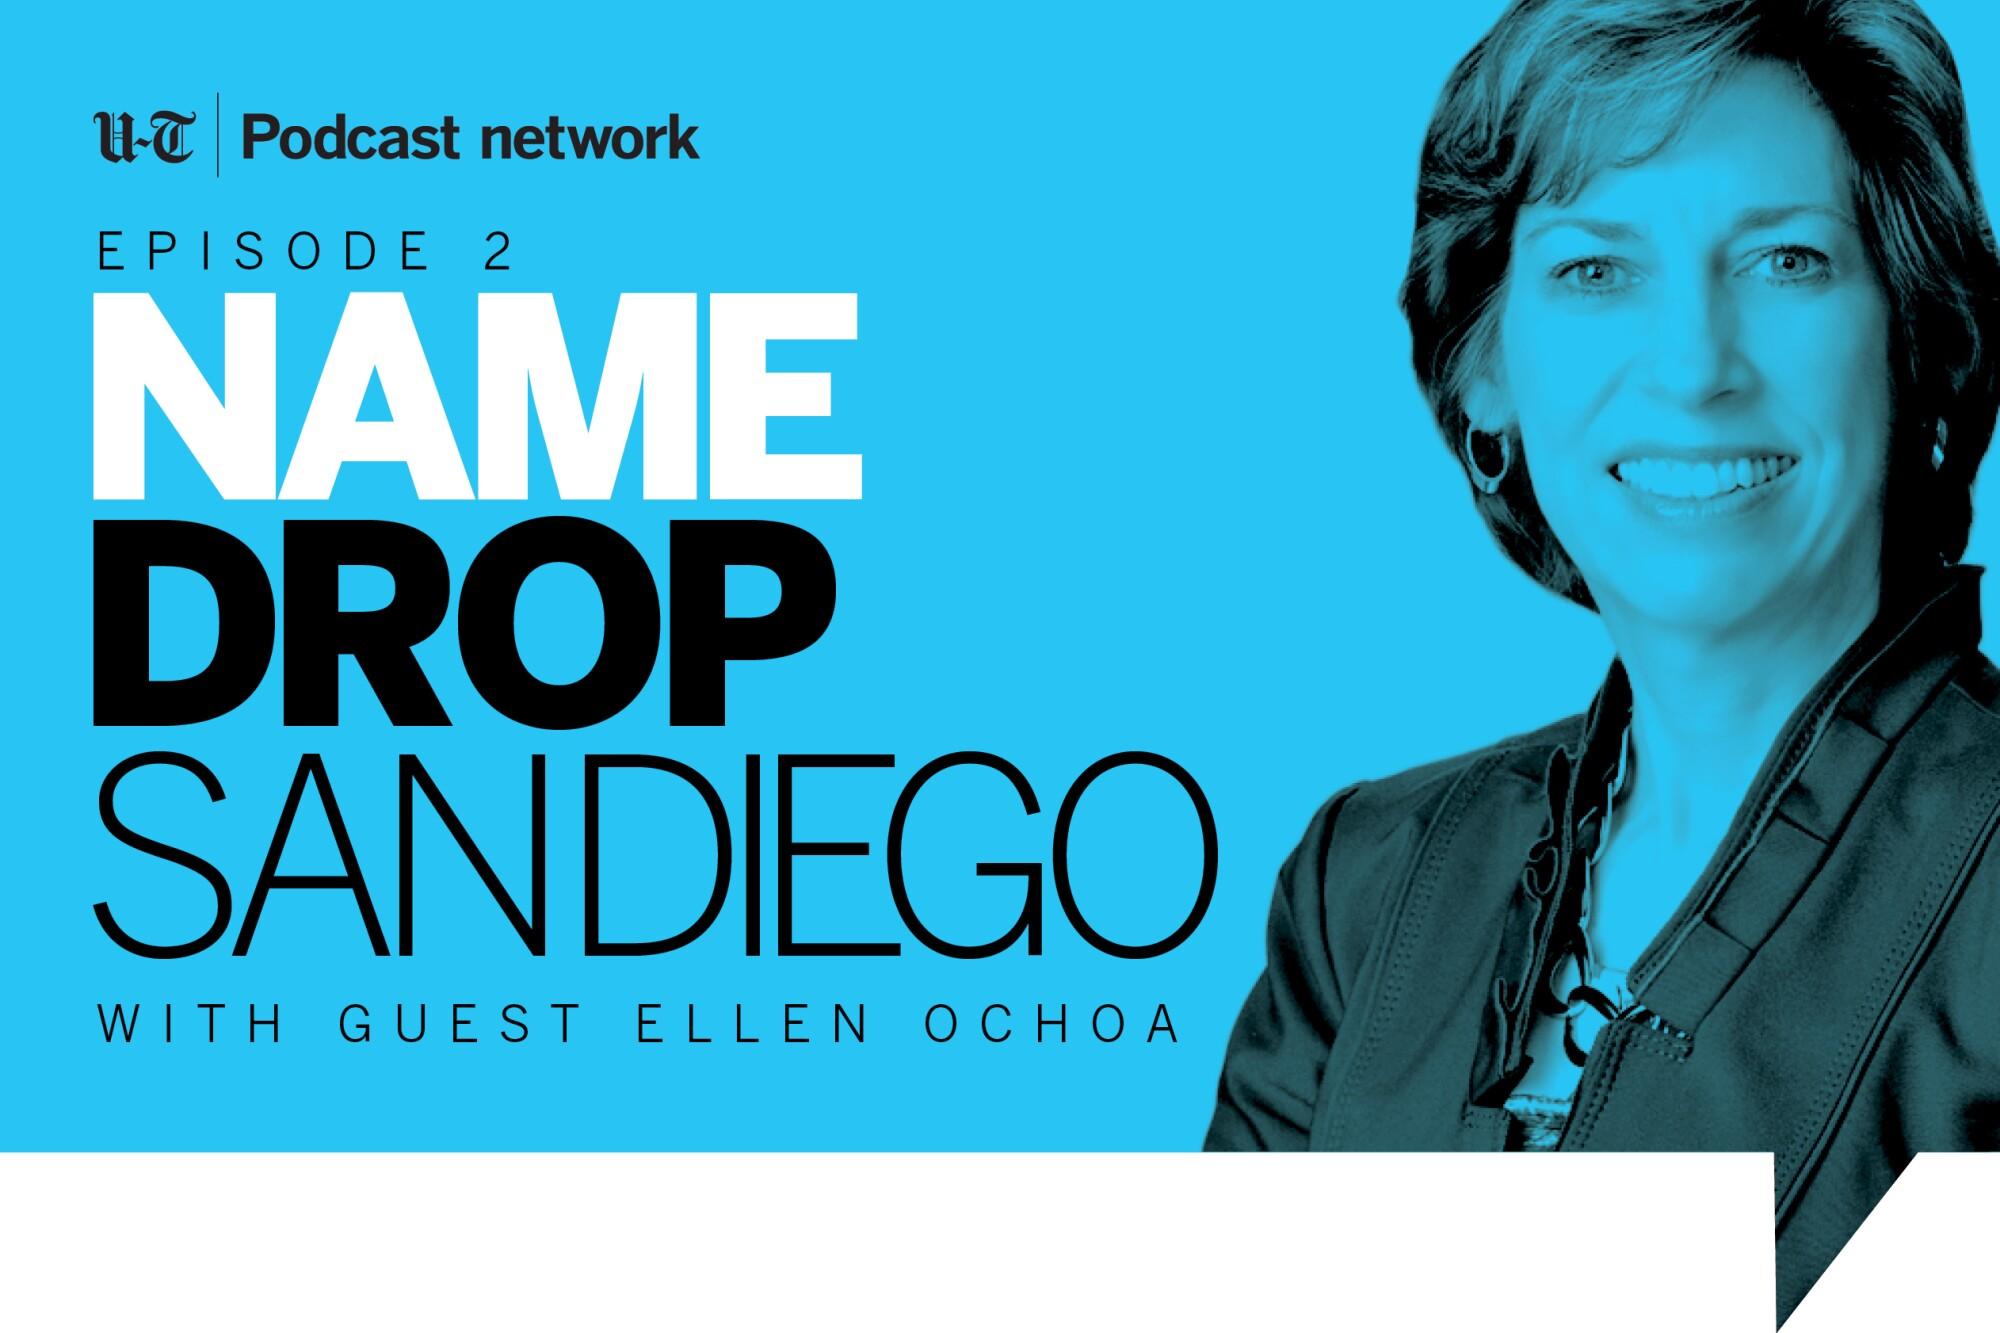 Ellen Ochoa on Name Drop San Diego.